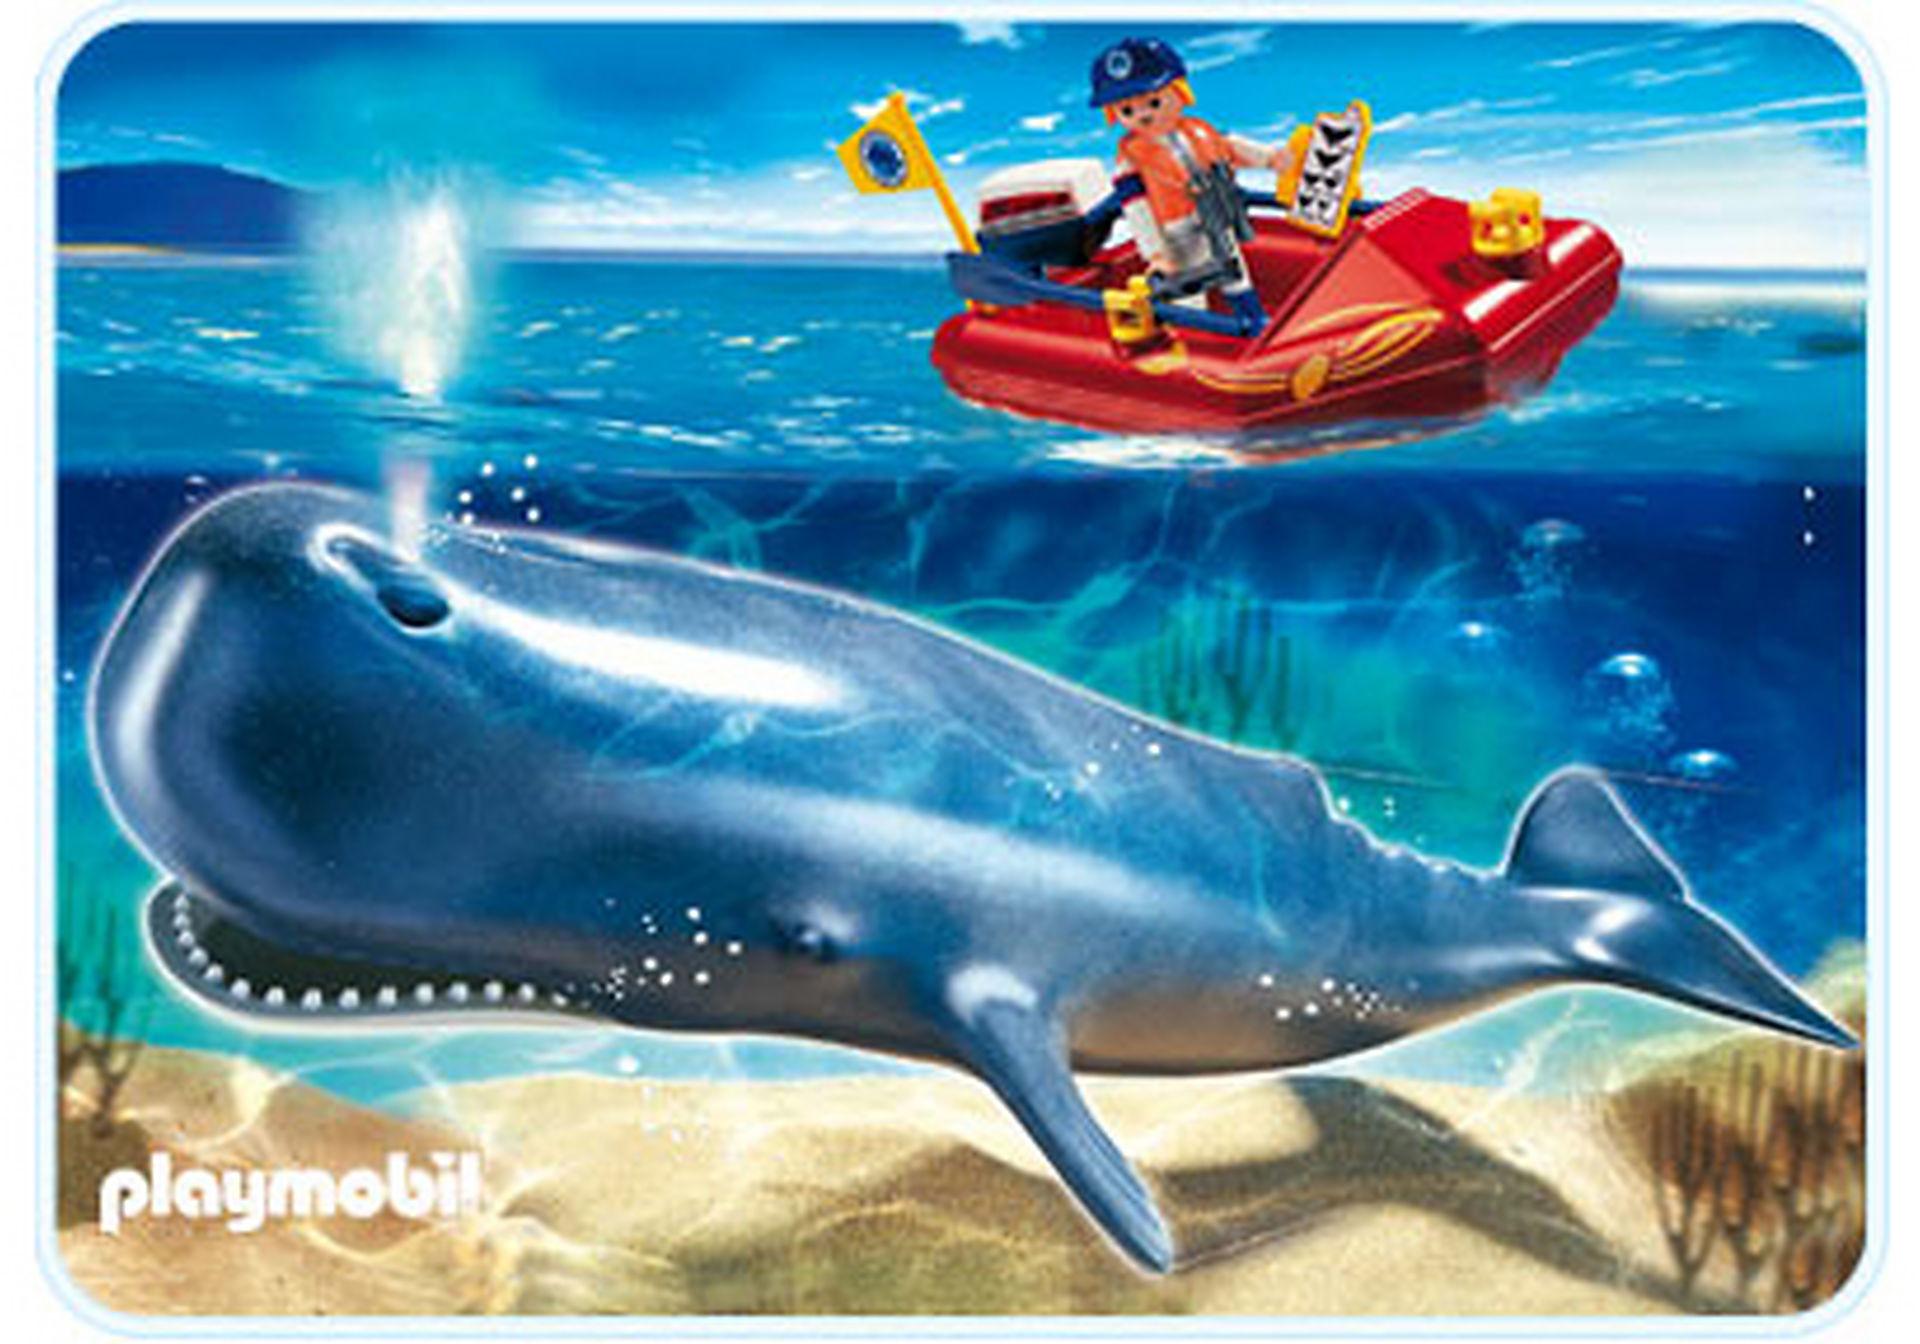 http://media.playmobil.com/i/playmobil/4489-A_product_detail/Forscher-Boot mit Pottwal